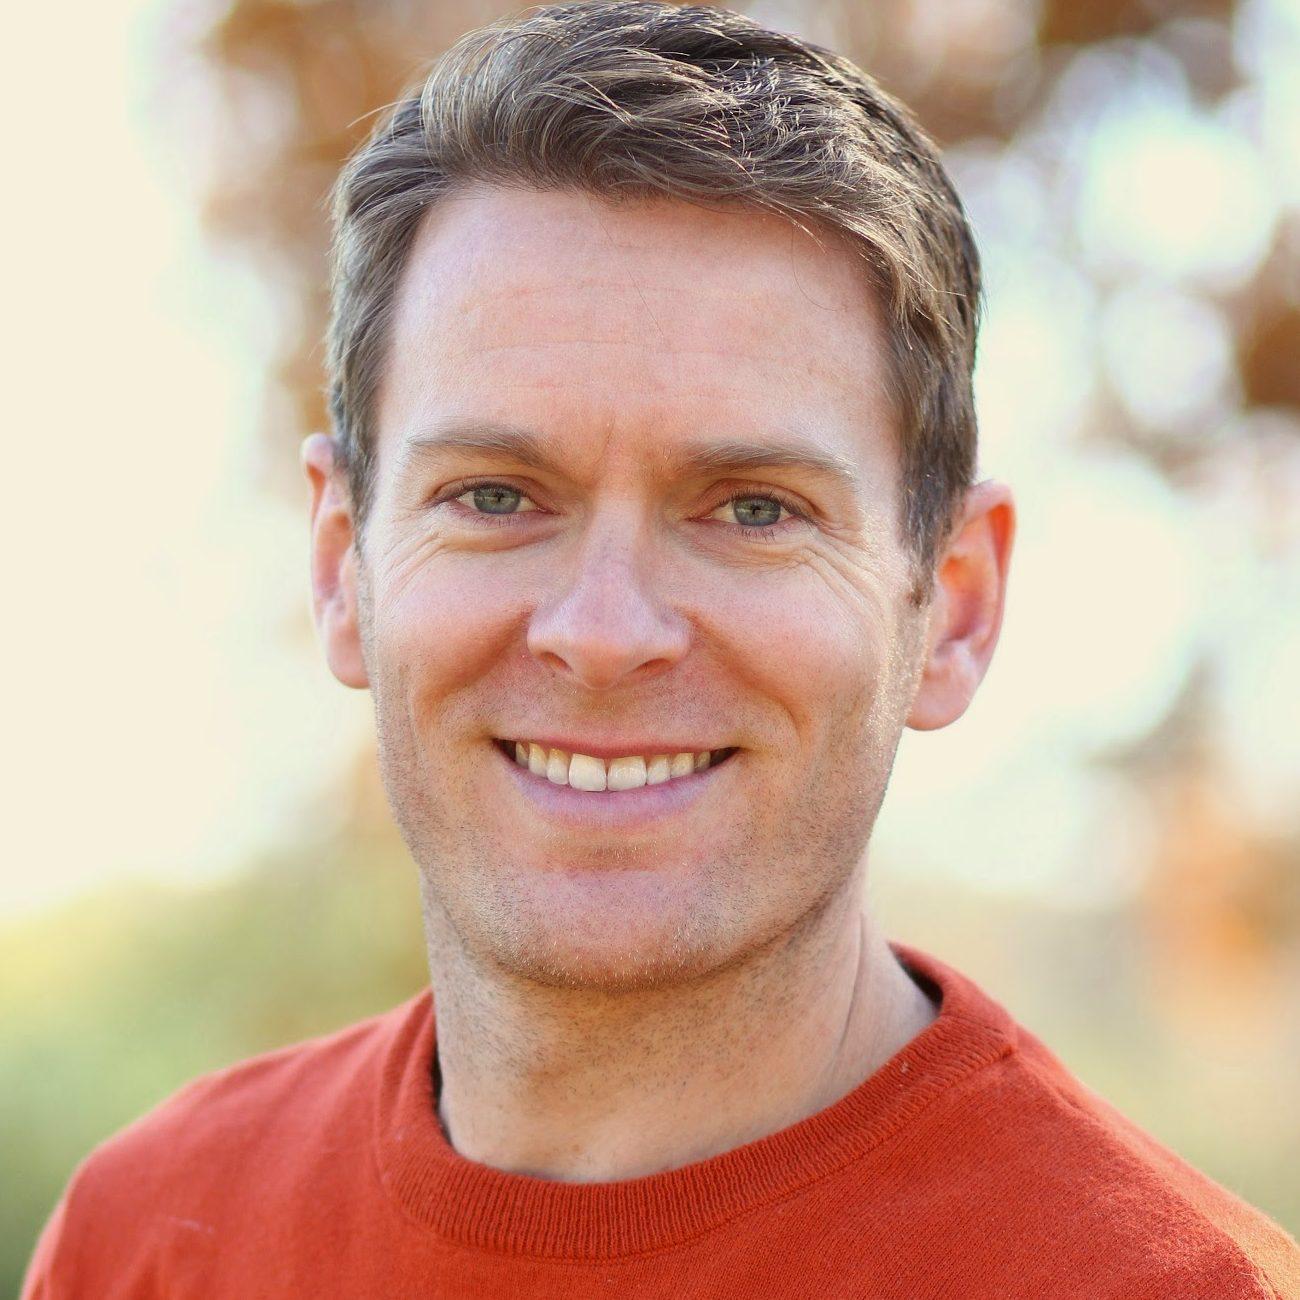 Casey McCollum